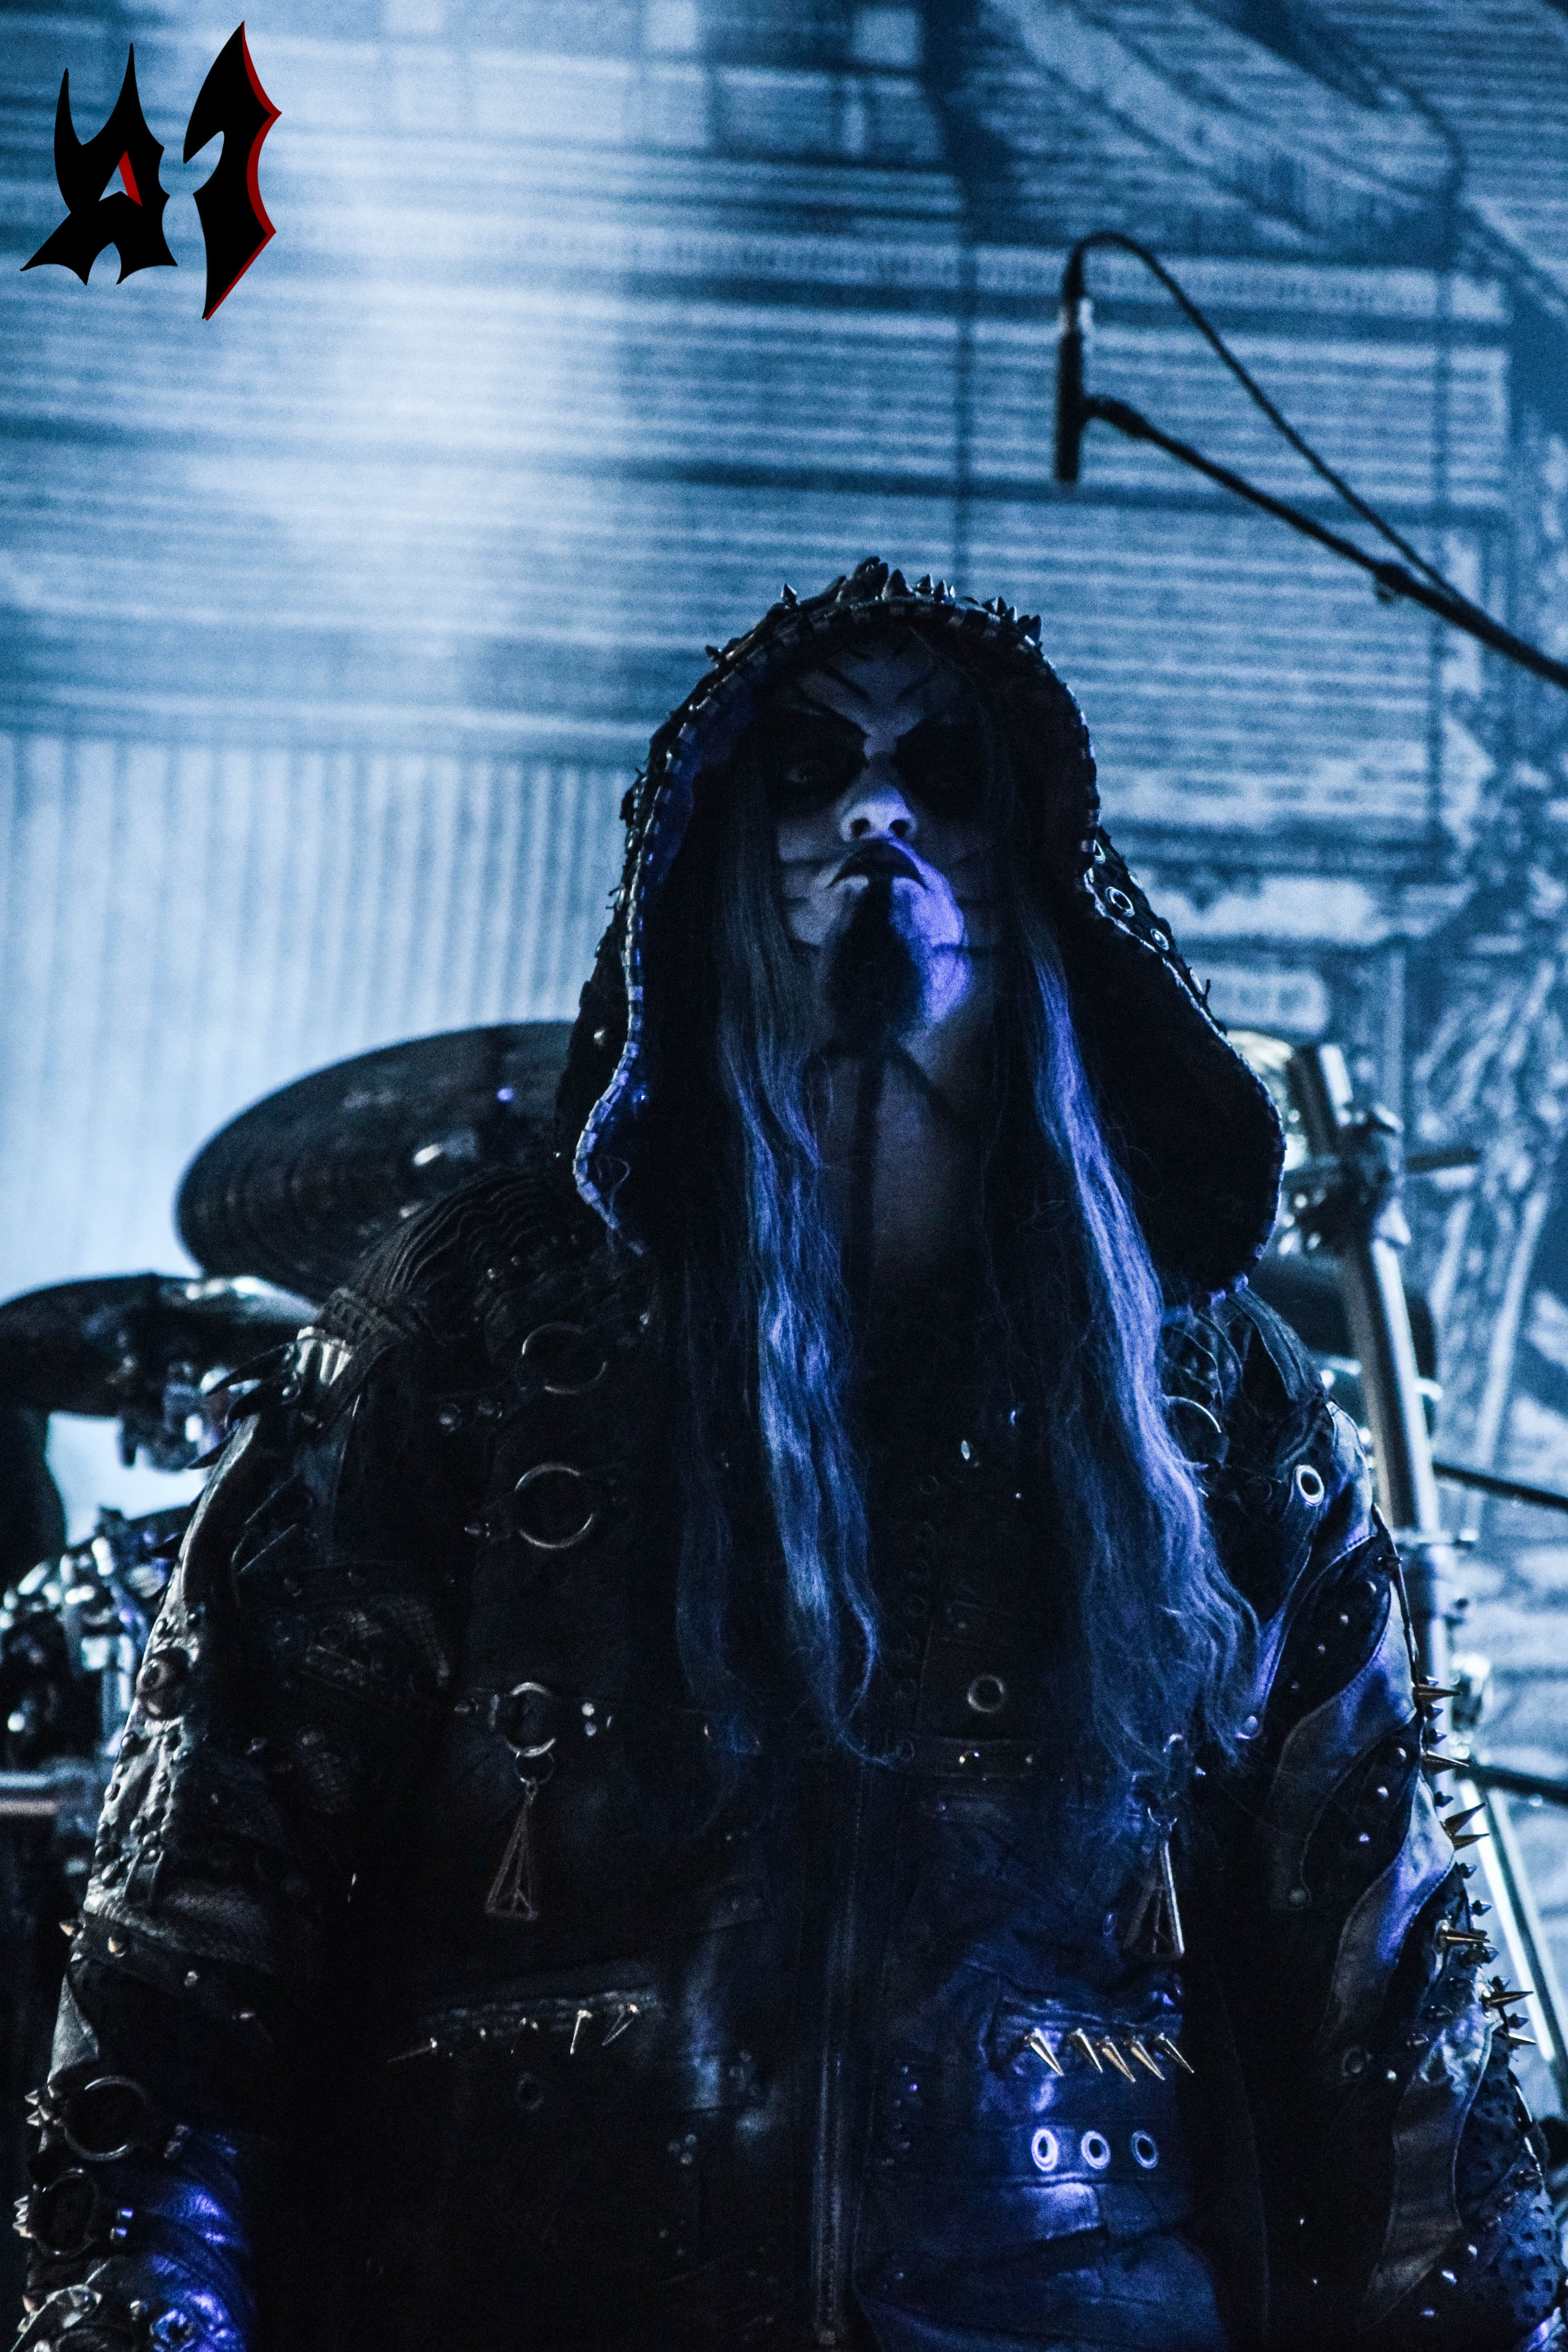 Hellfest - Jour 2 - Dimmu Borgir 6